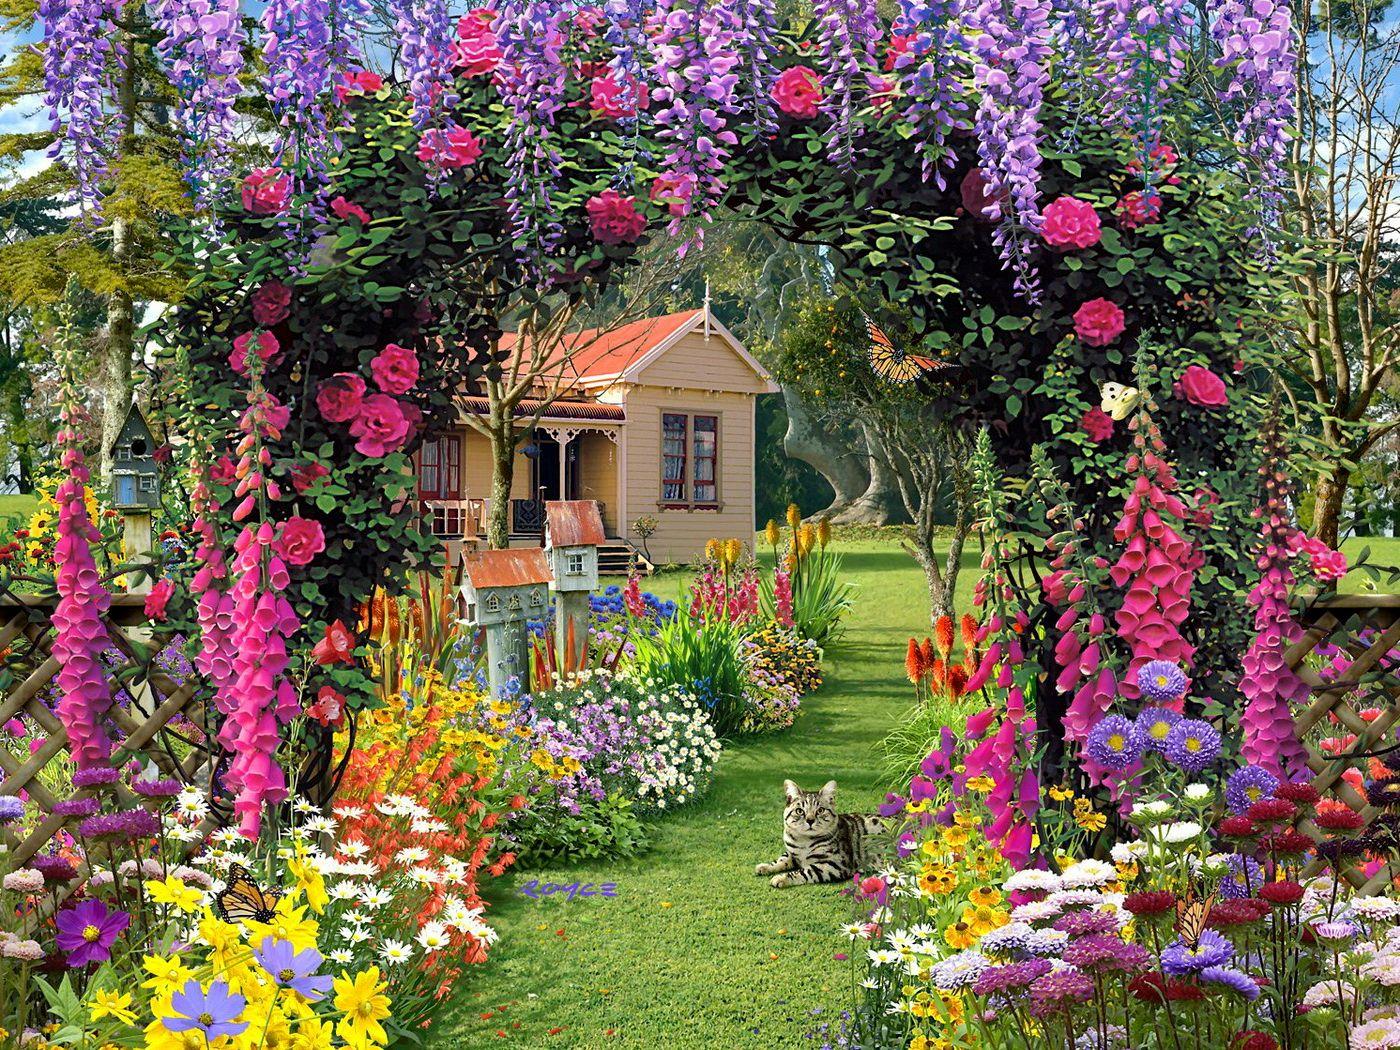 Home Flower Gardens Hd Wallpaper Background Images Beautiful Flowers Garden Cottage Garden Design Beautiful Gardens